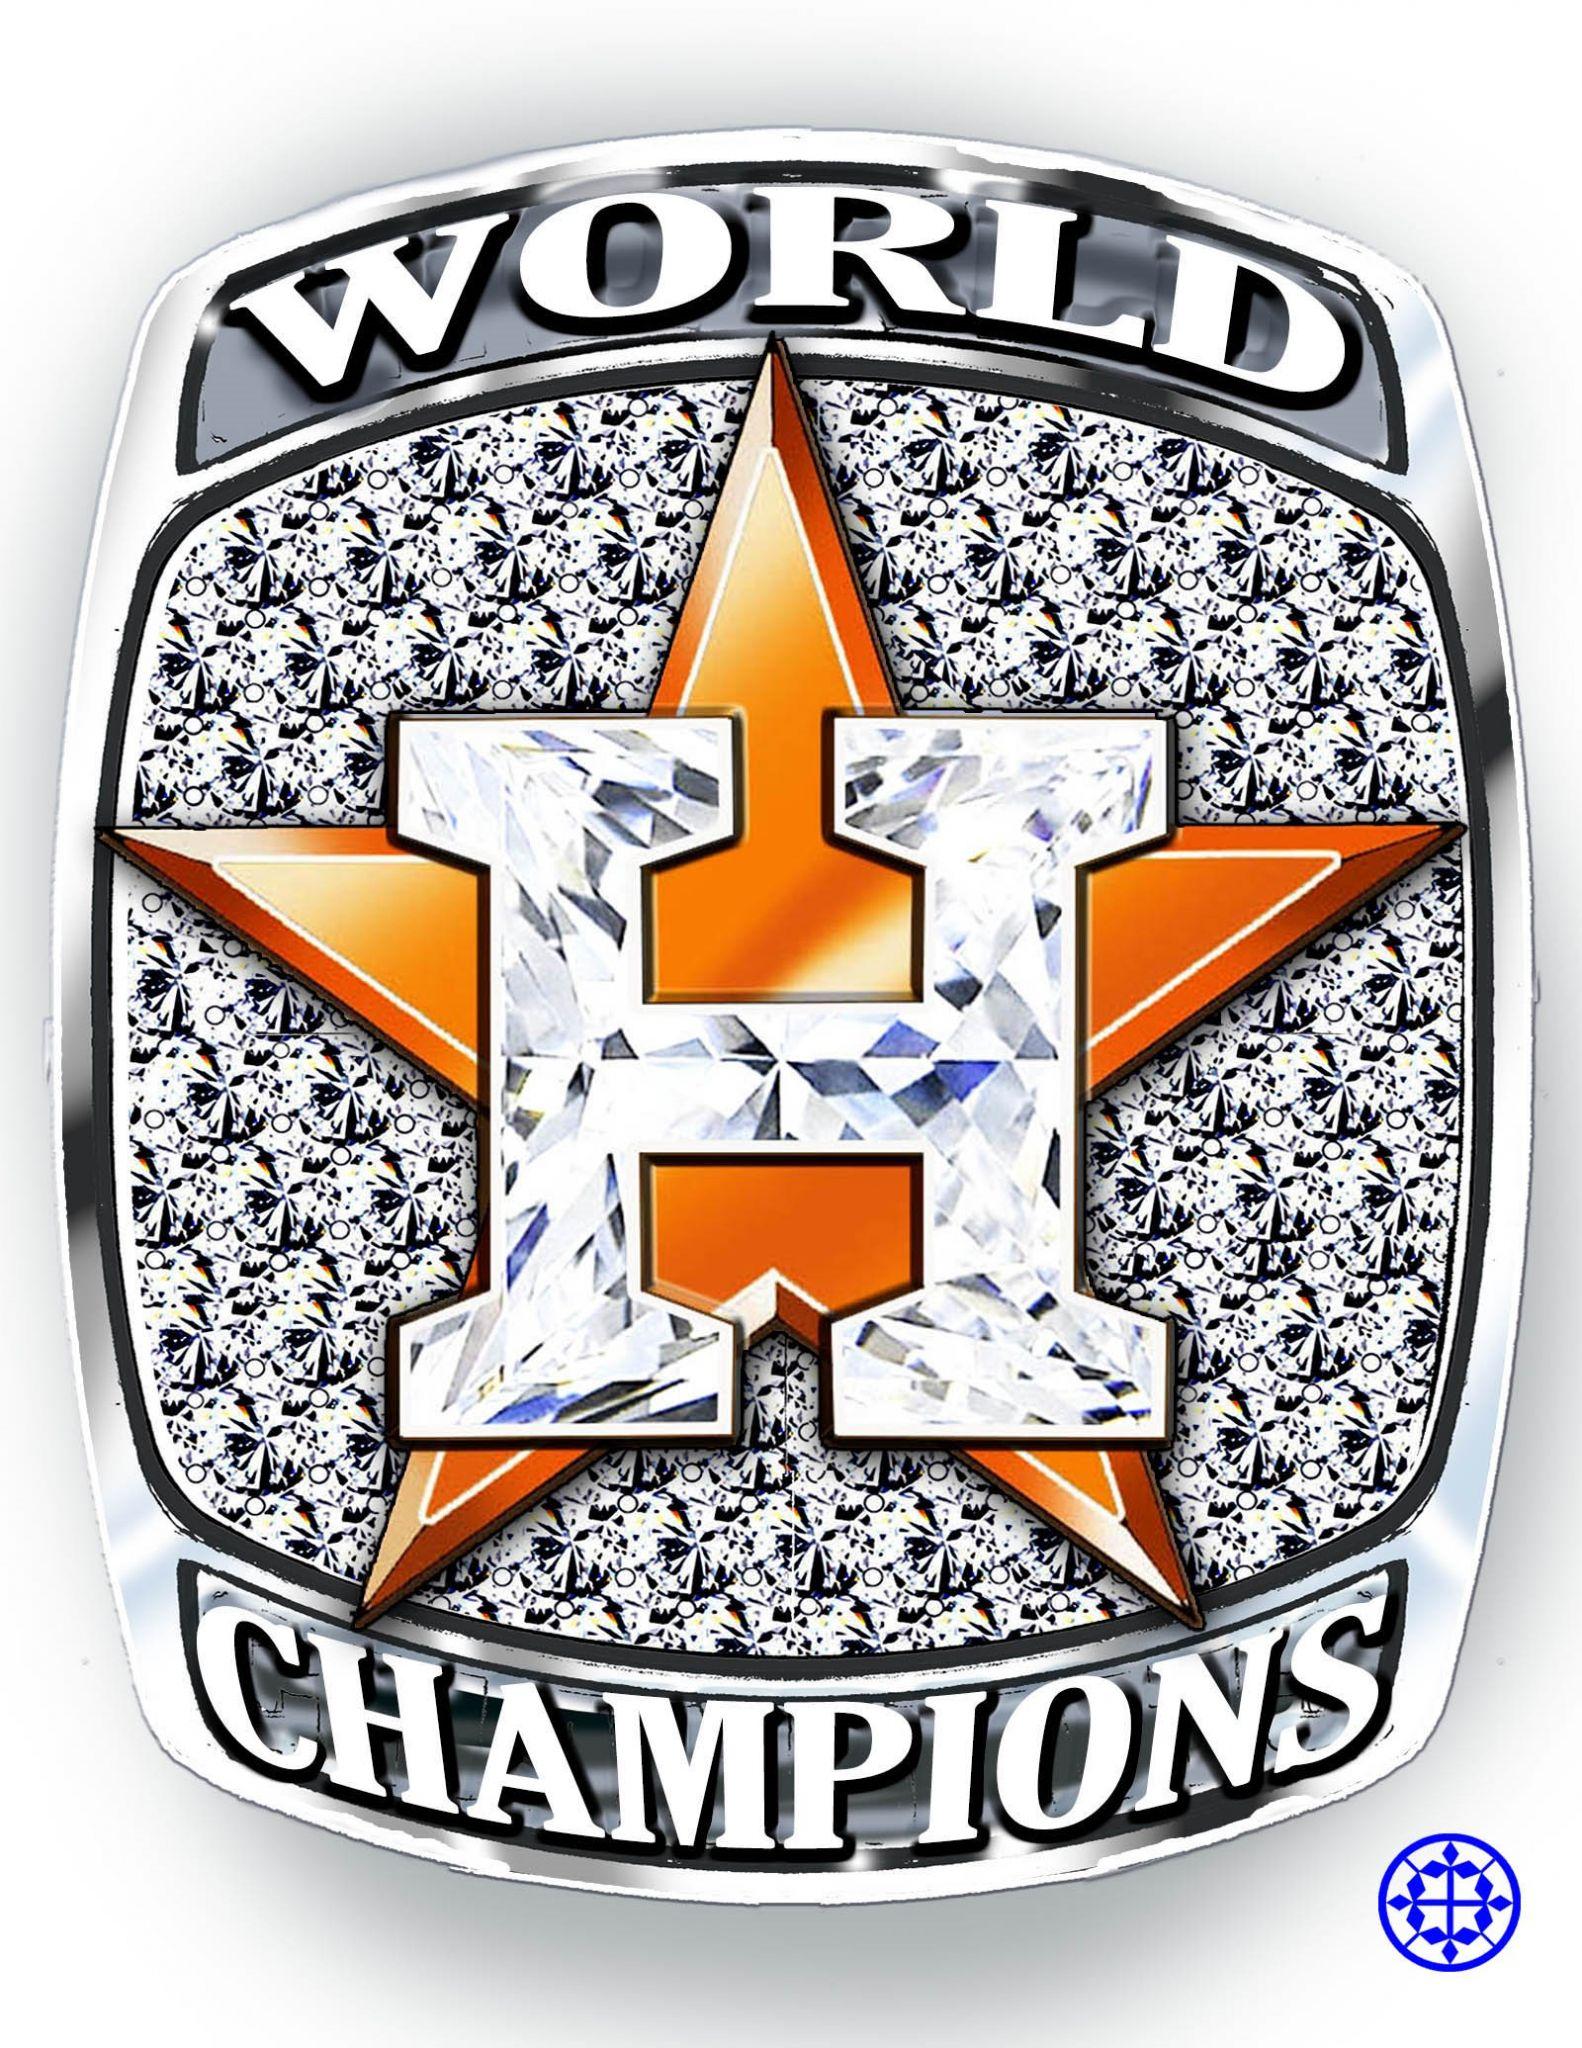 Astros Championship Rings